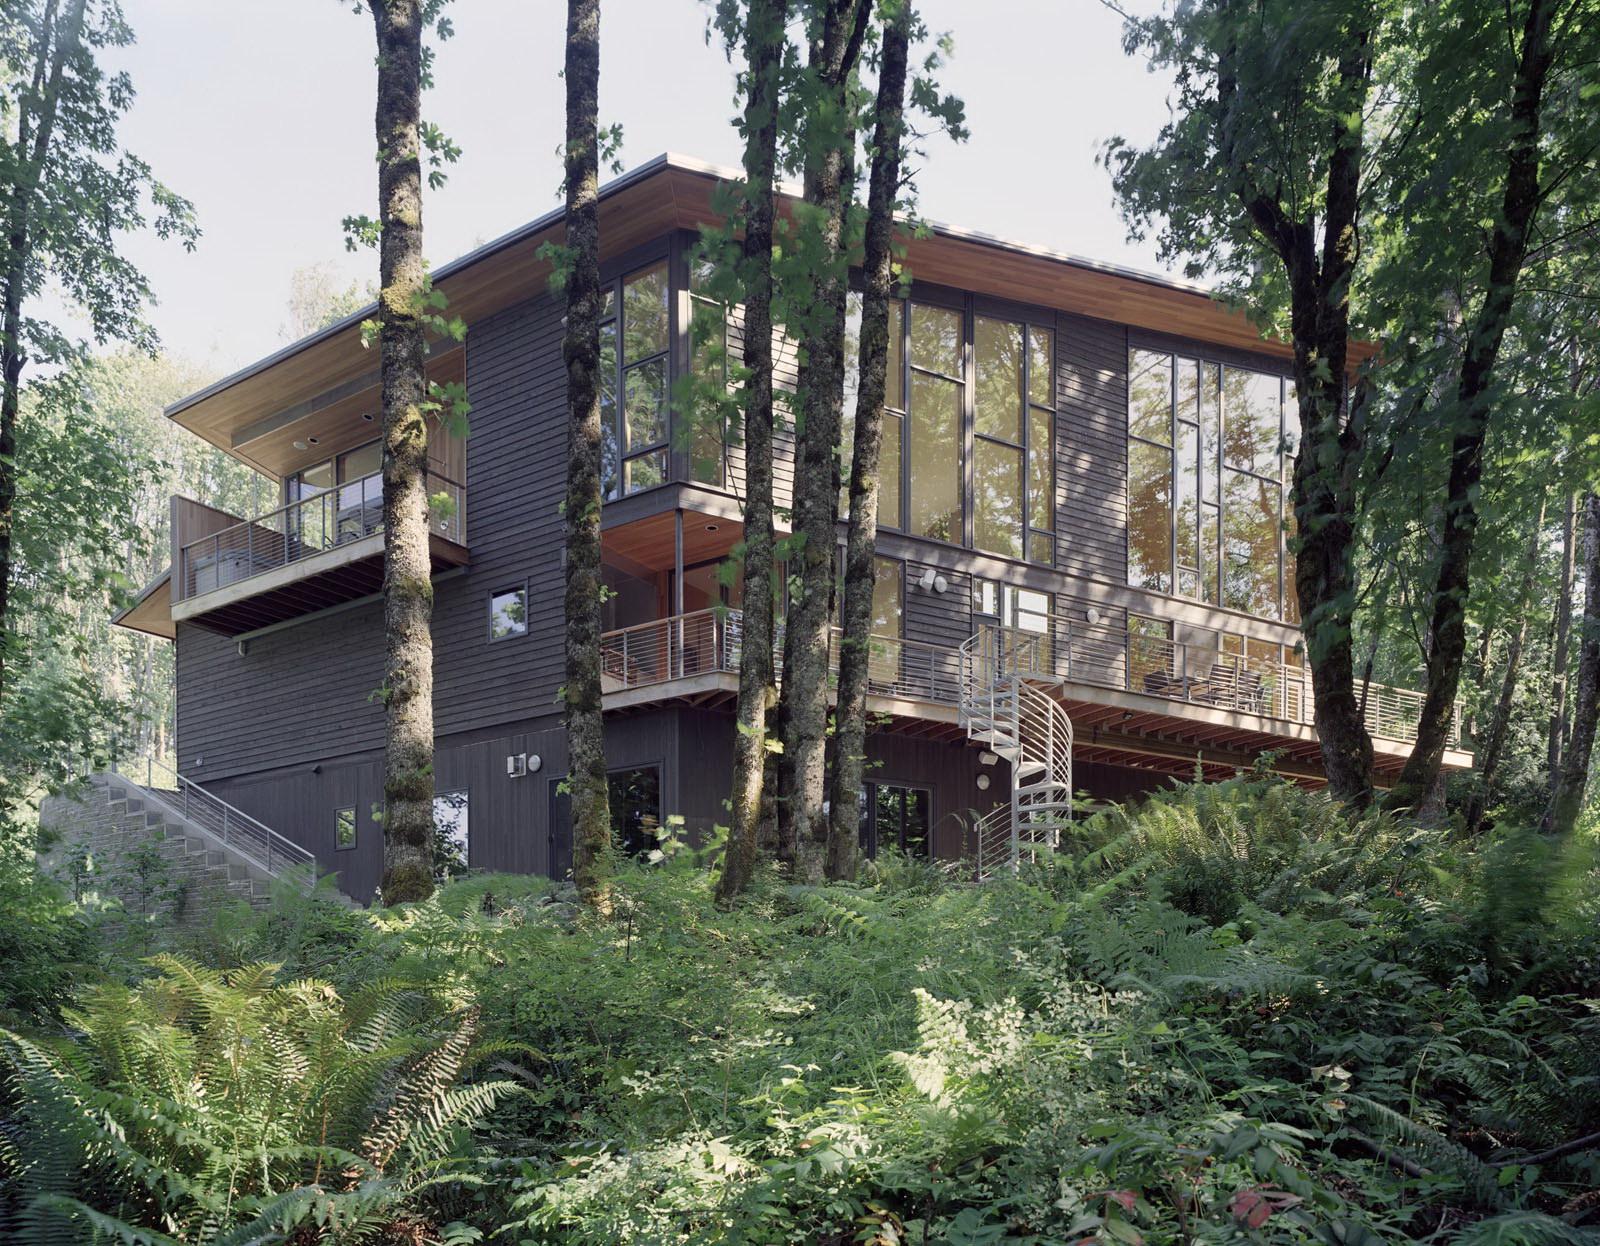 Kitchel House by Bora Architects